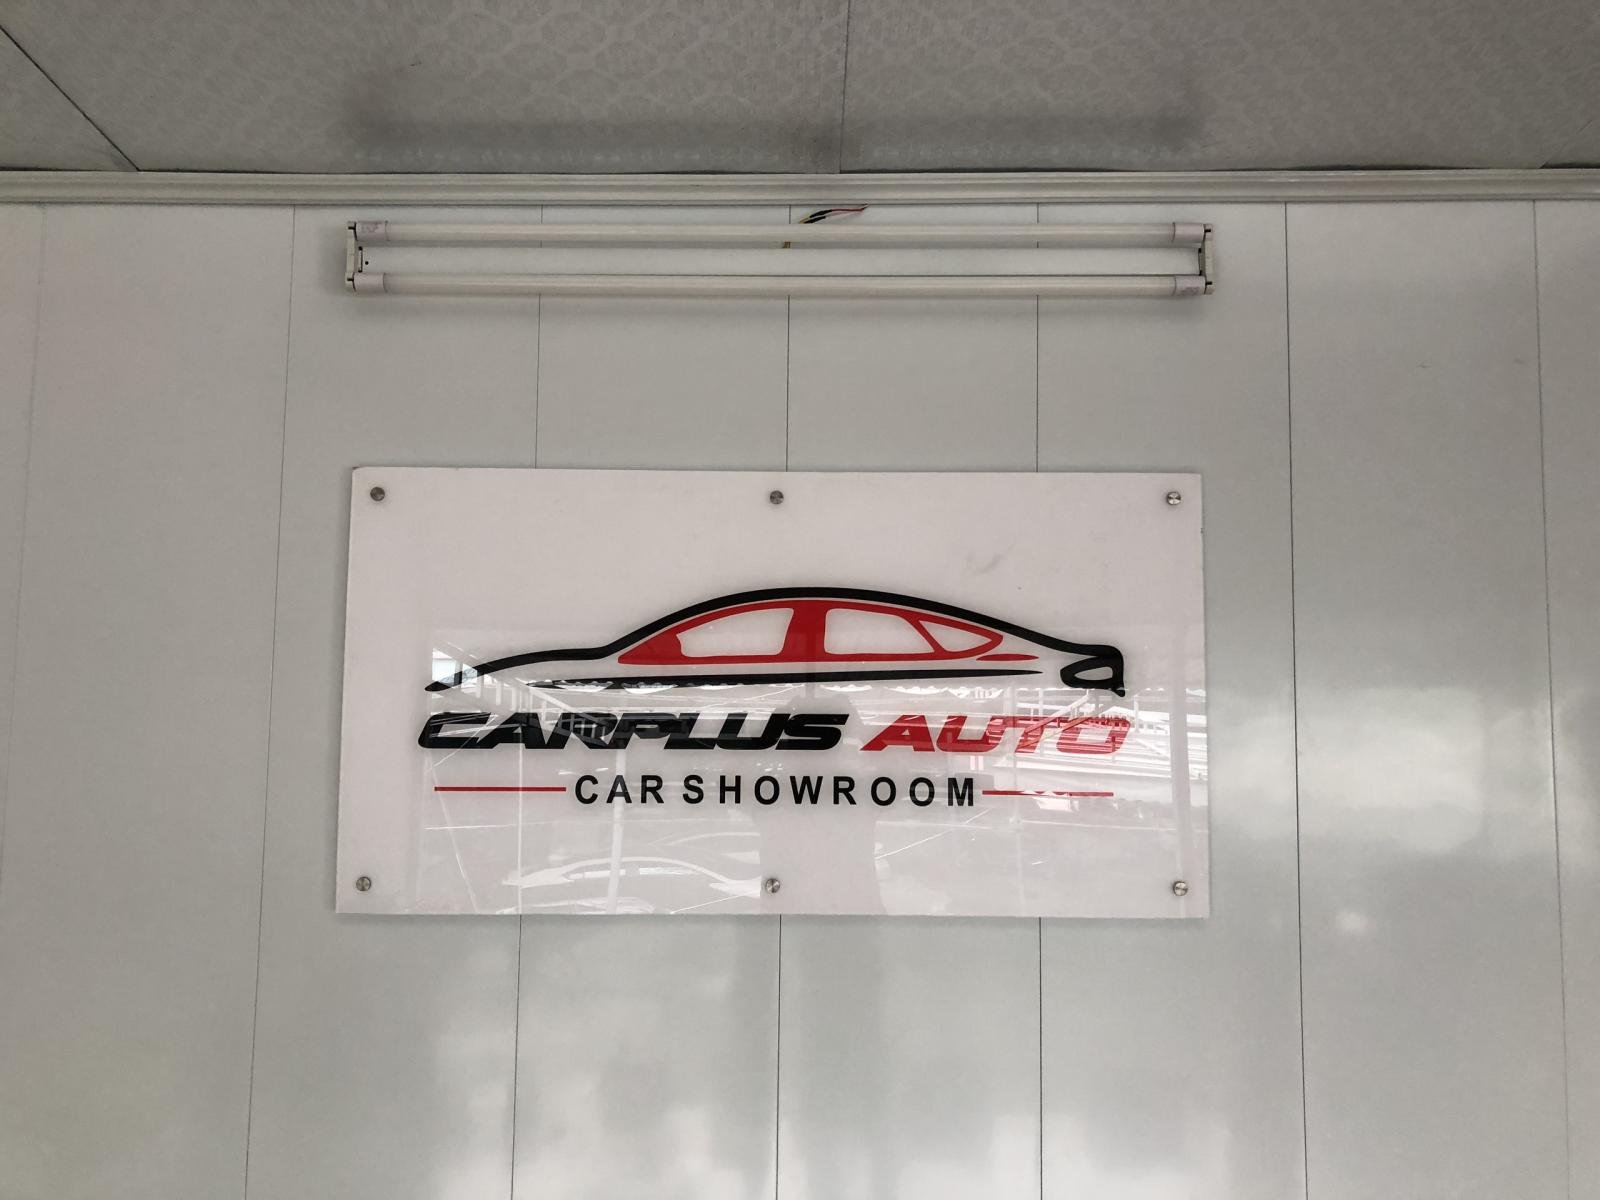 CarPlus Auto (1)